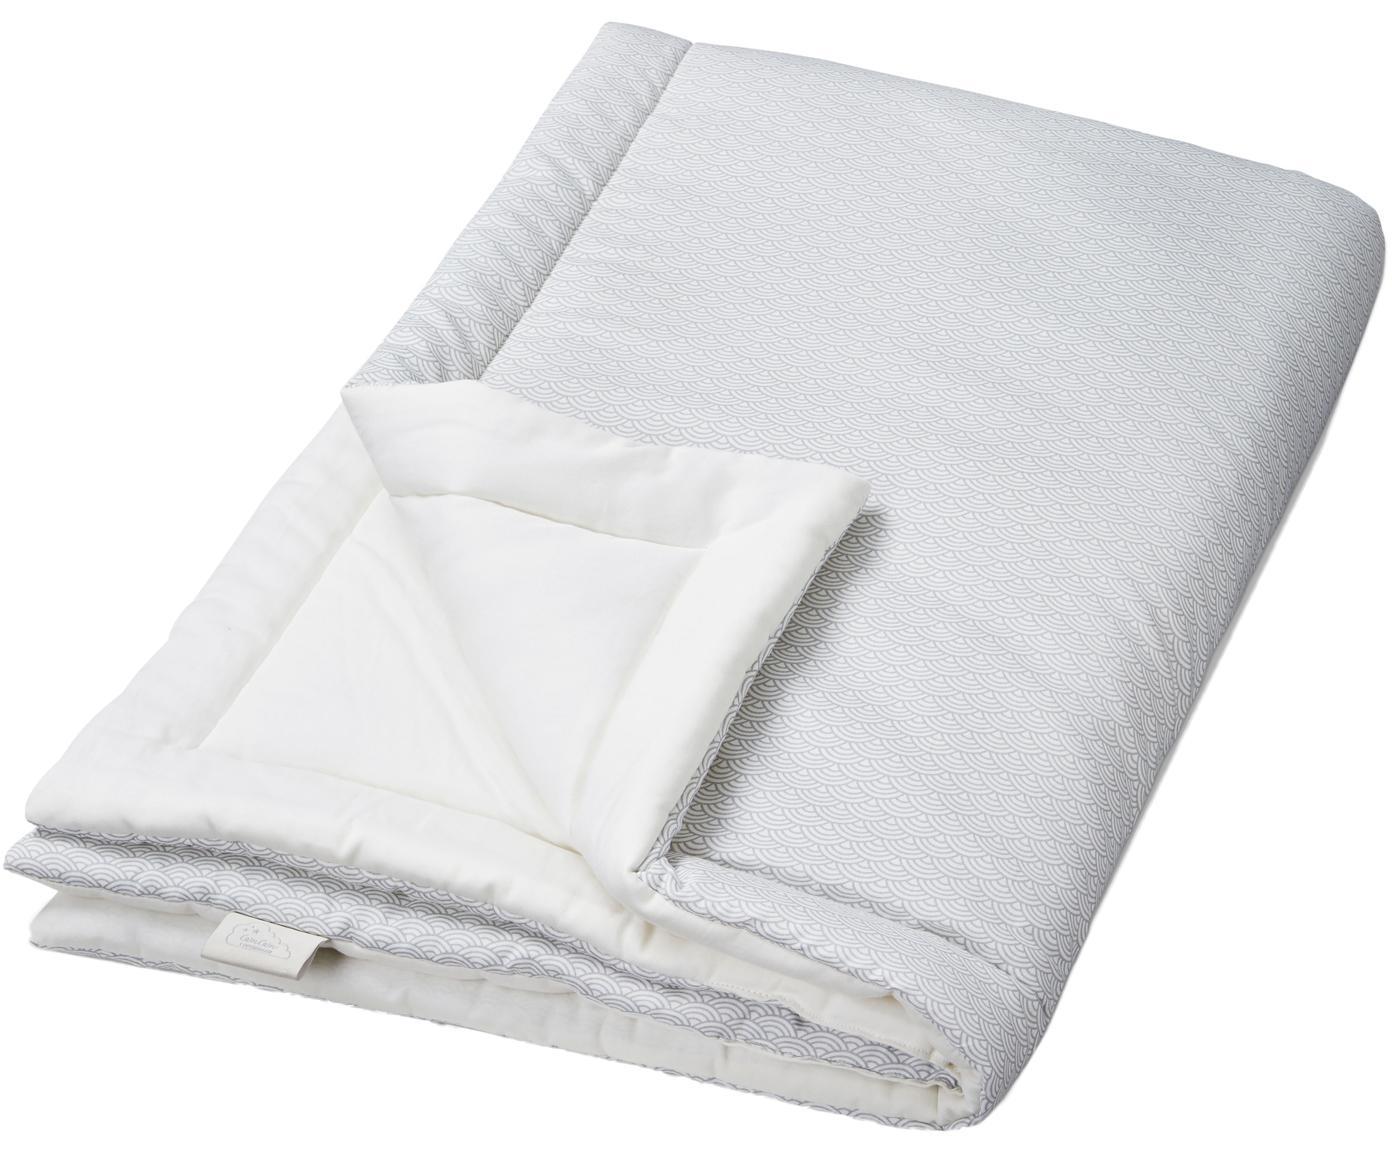 Cubrecolhón bebé Wave, Exterior: algodón orgánico, Gris, blanco, An 90 x L 120 cm